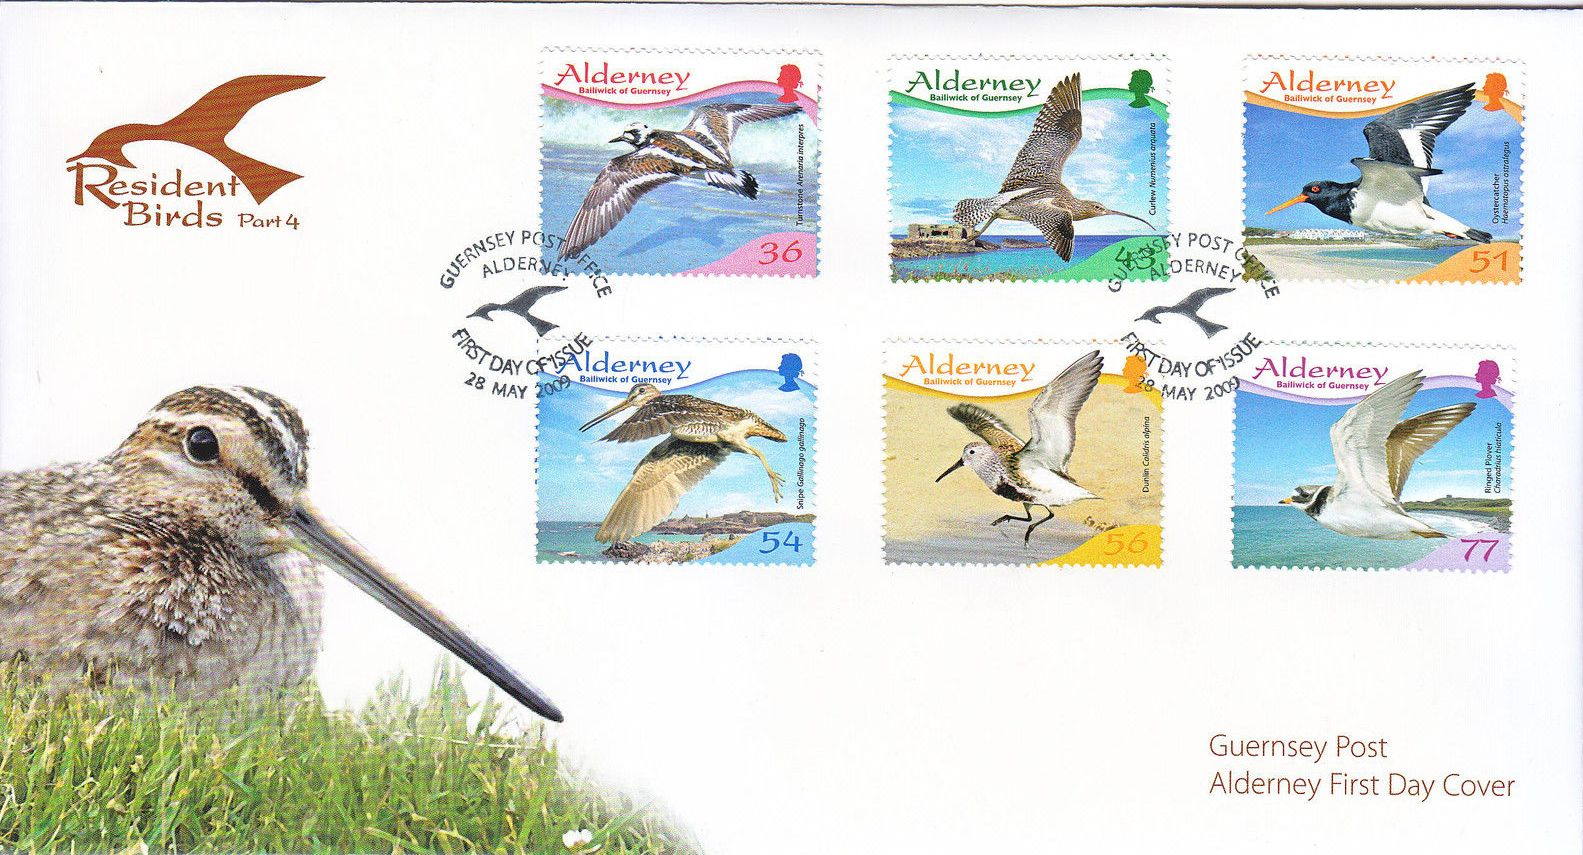 Alderney 2009 Resident Birds Part 4 (Waders) h.jpg